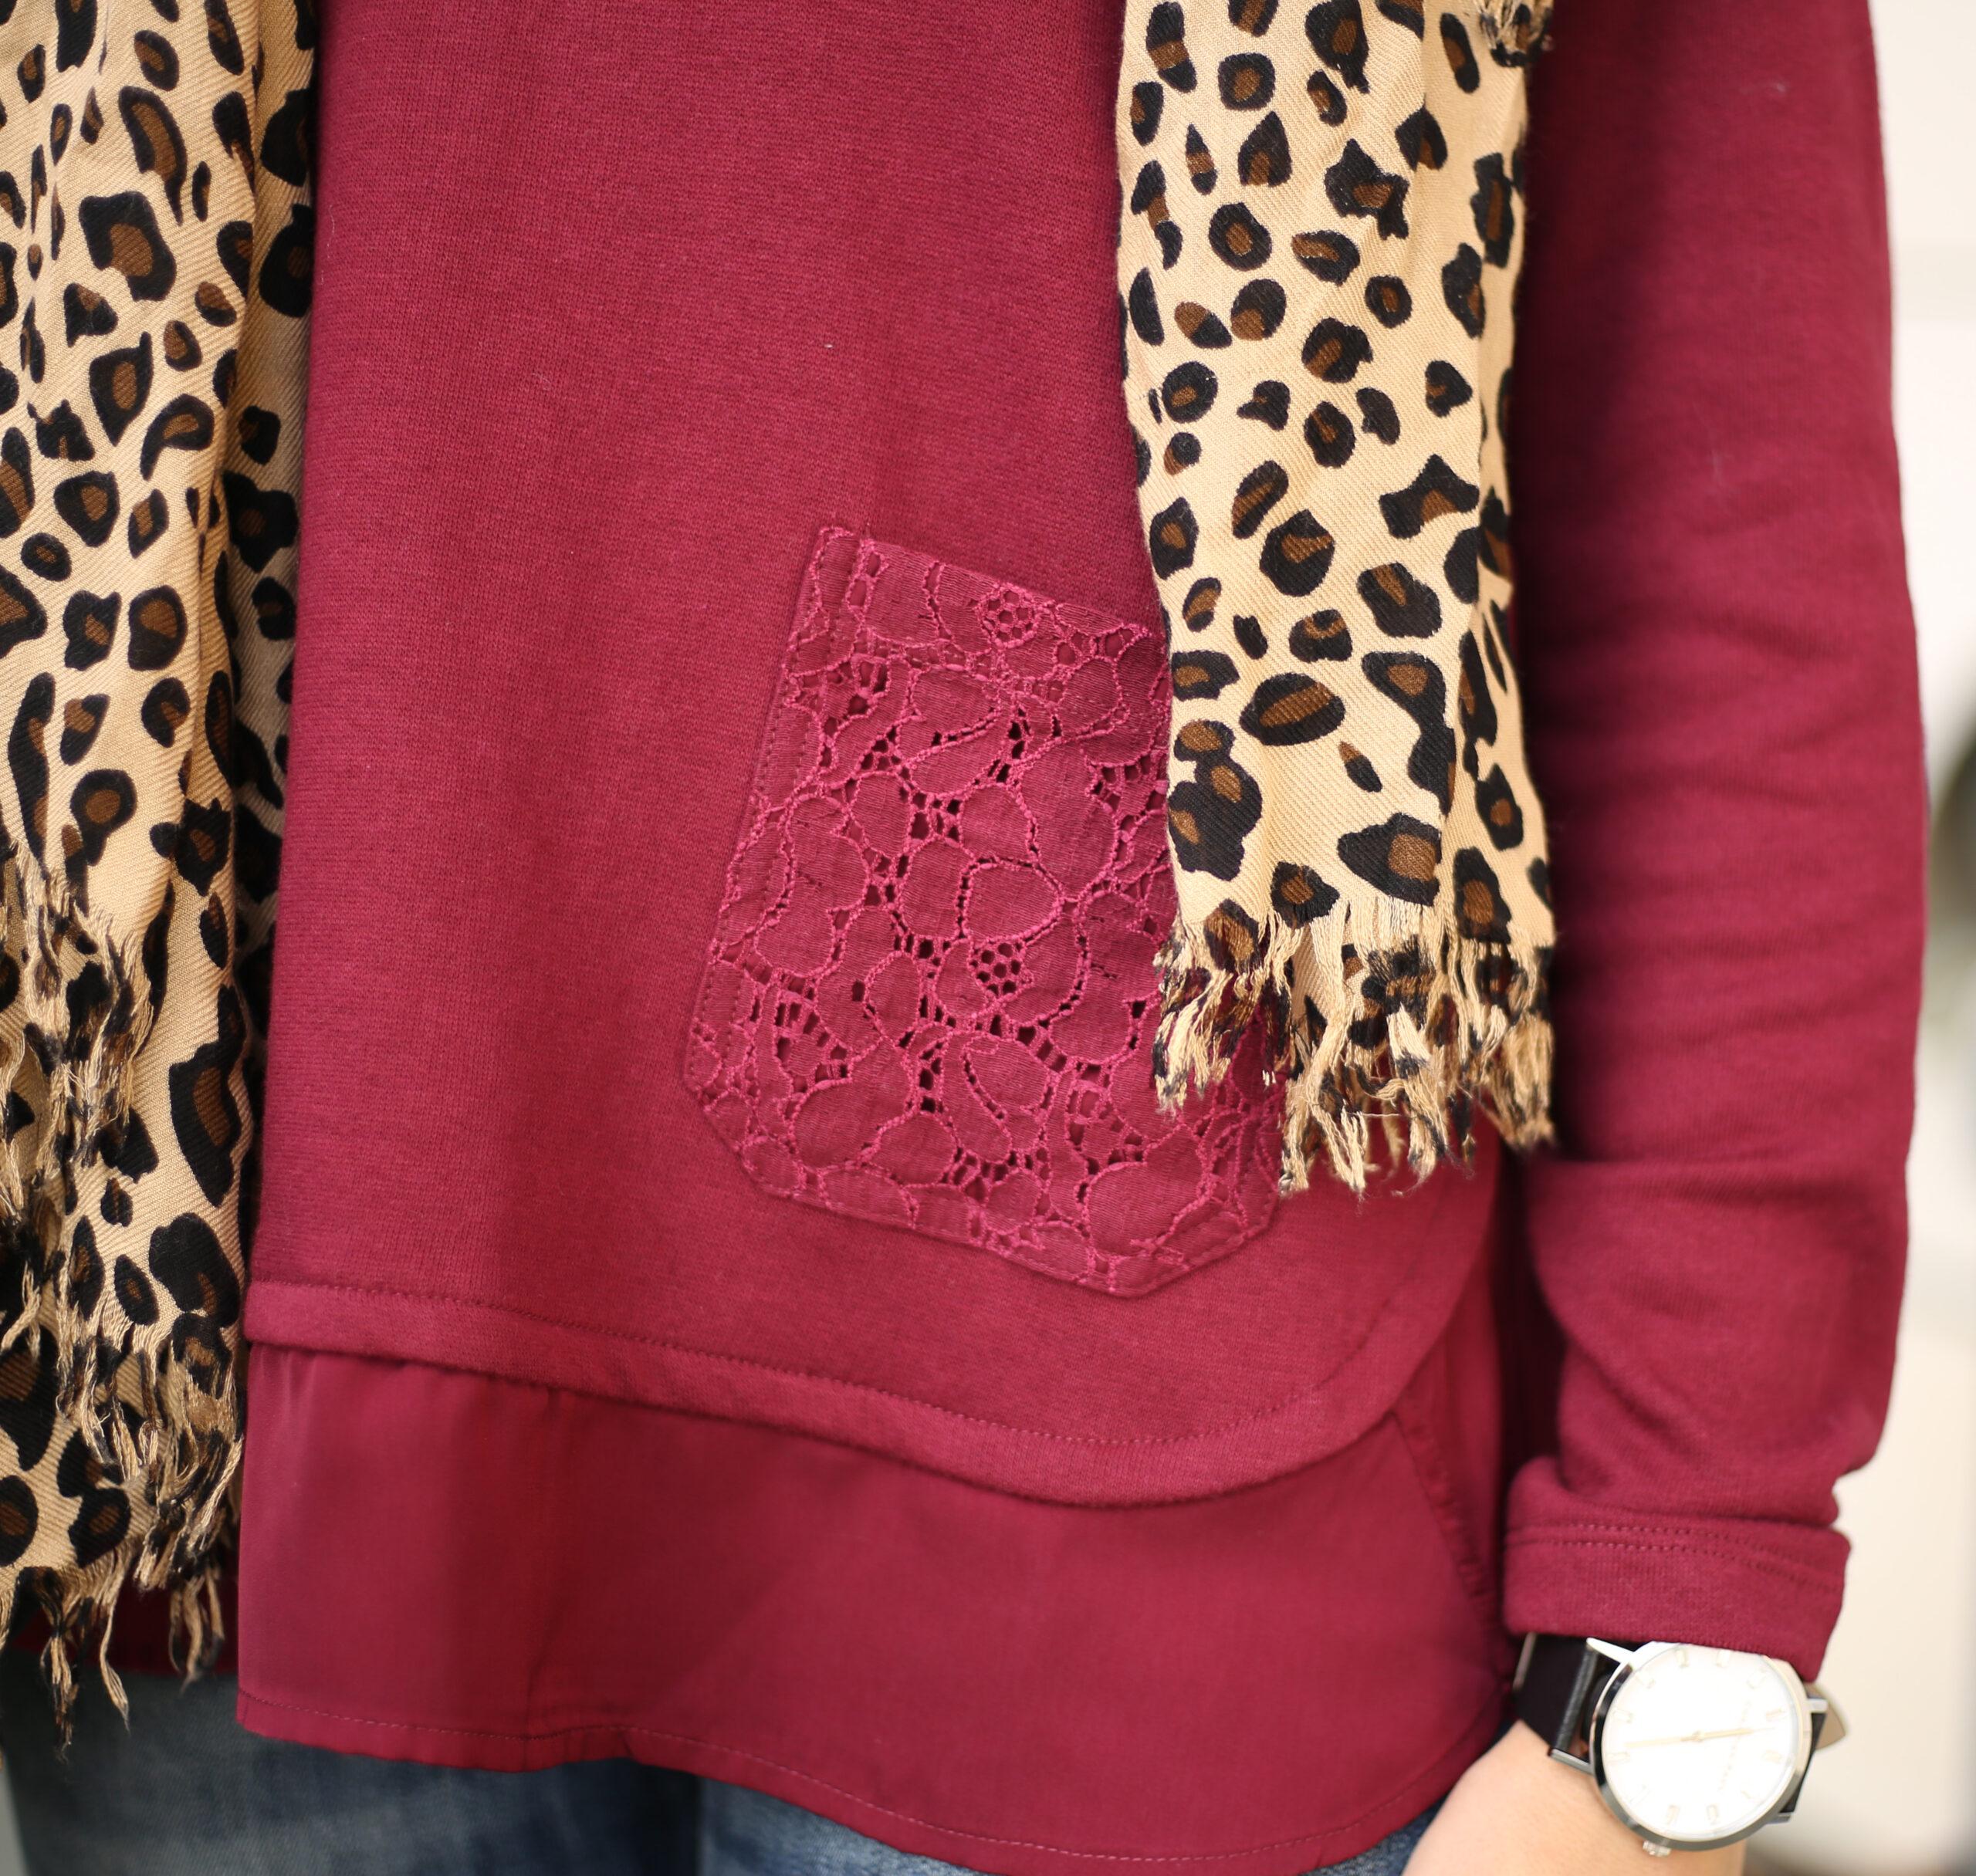 leopard scarf merlot top